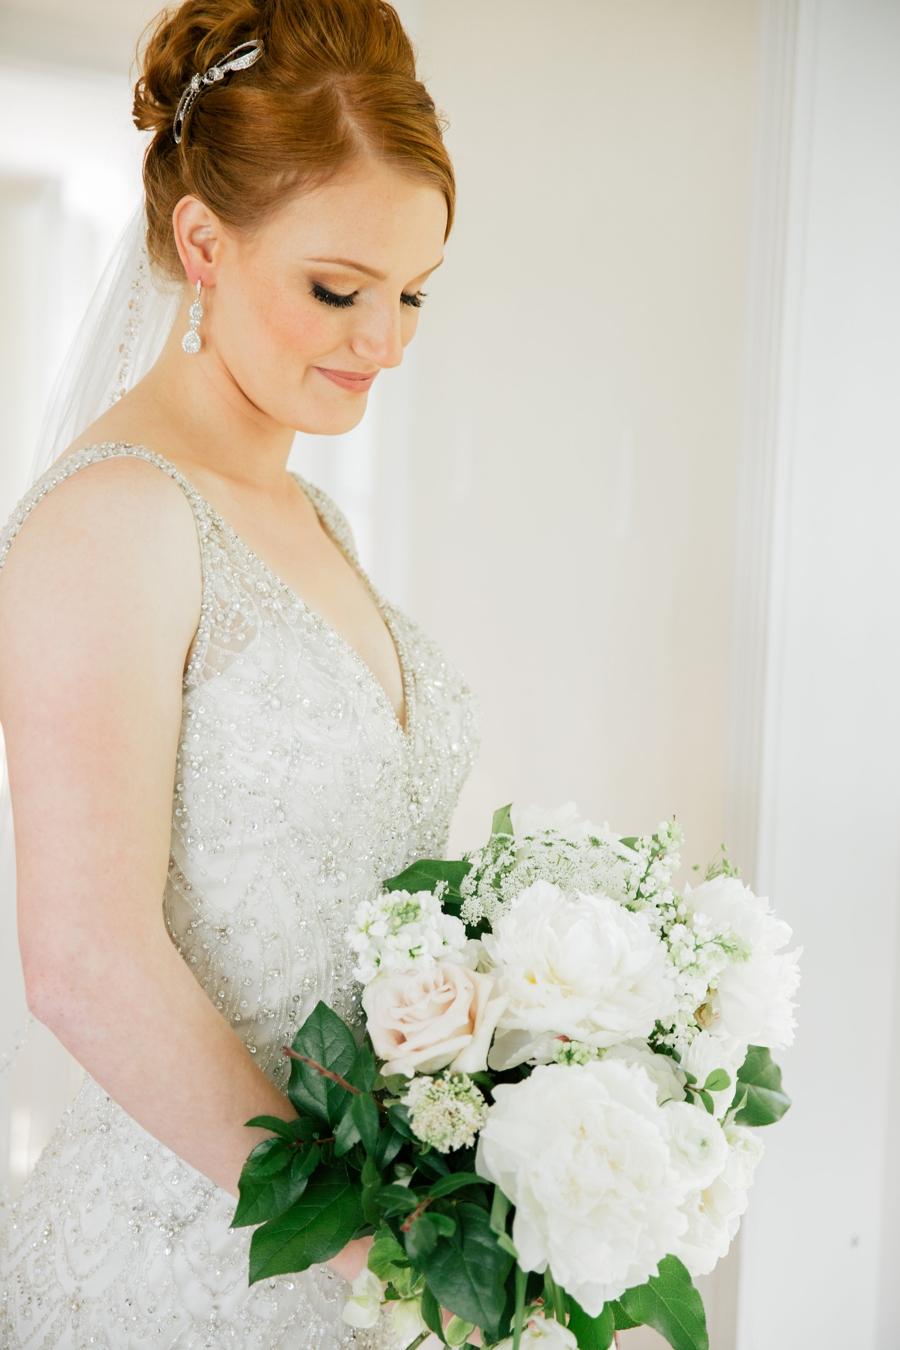 South_Seas_Island_Resort_Destination_Wedding_Planner_Captiva_Sanibel_Weddings_1802.jpg